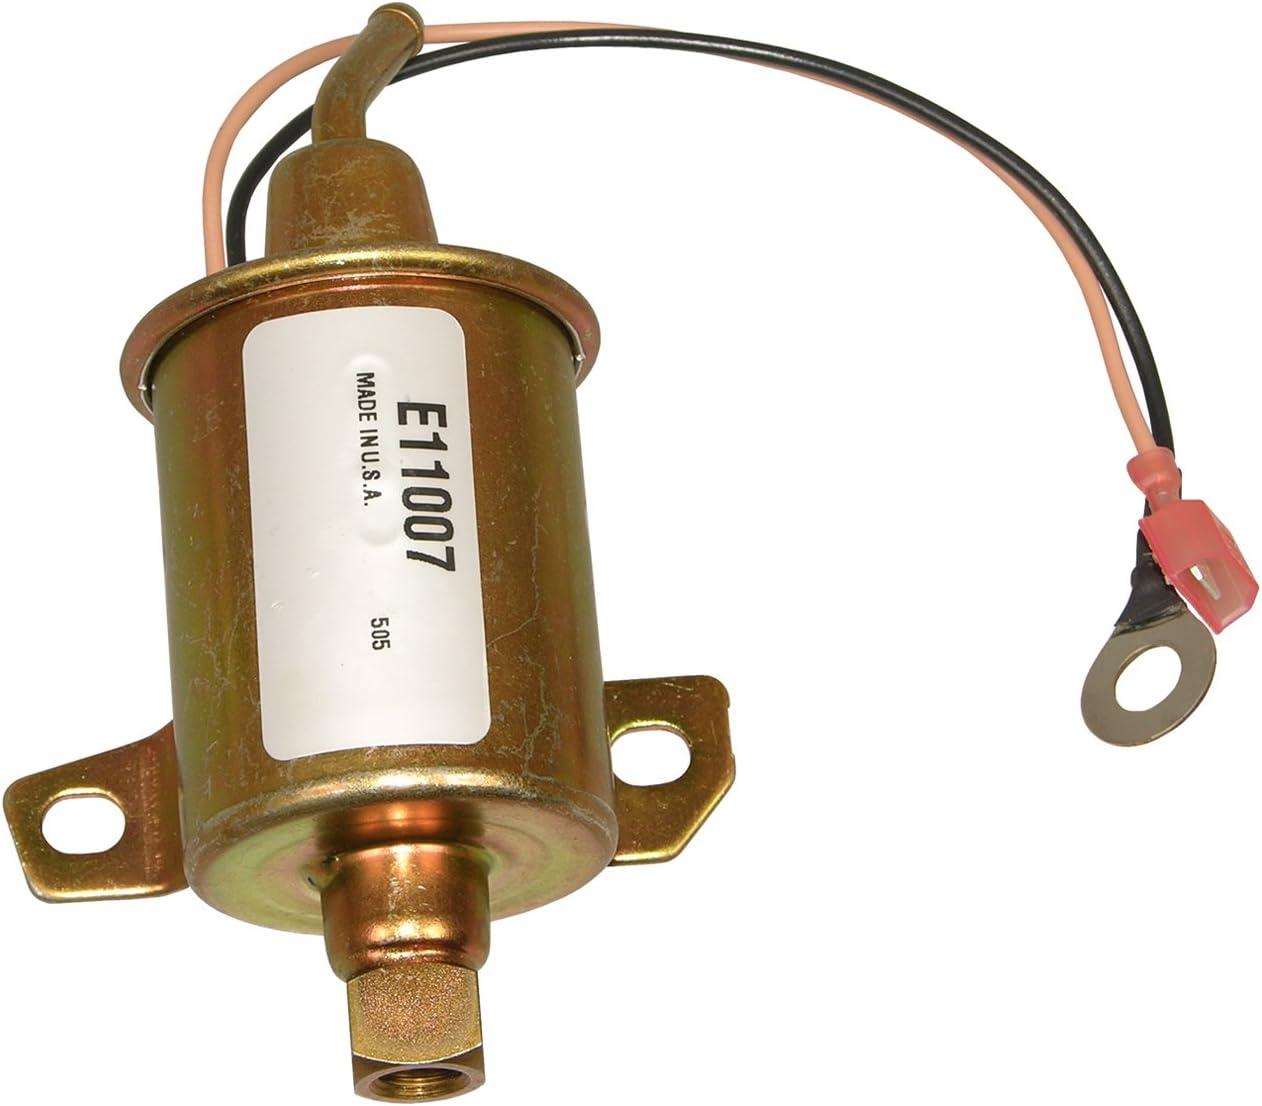 onan fuel pump wiring diagram amazon com airtex e11007 electric fuel pump for onan generator  electric fuel pump for onan generator